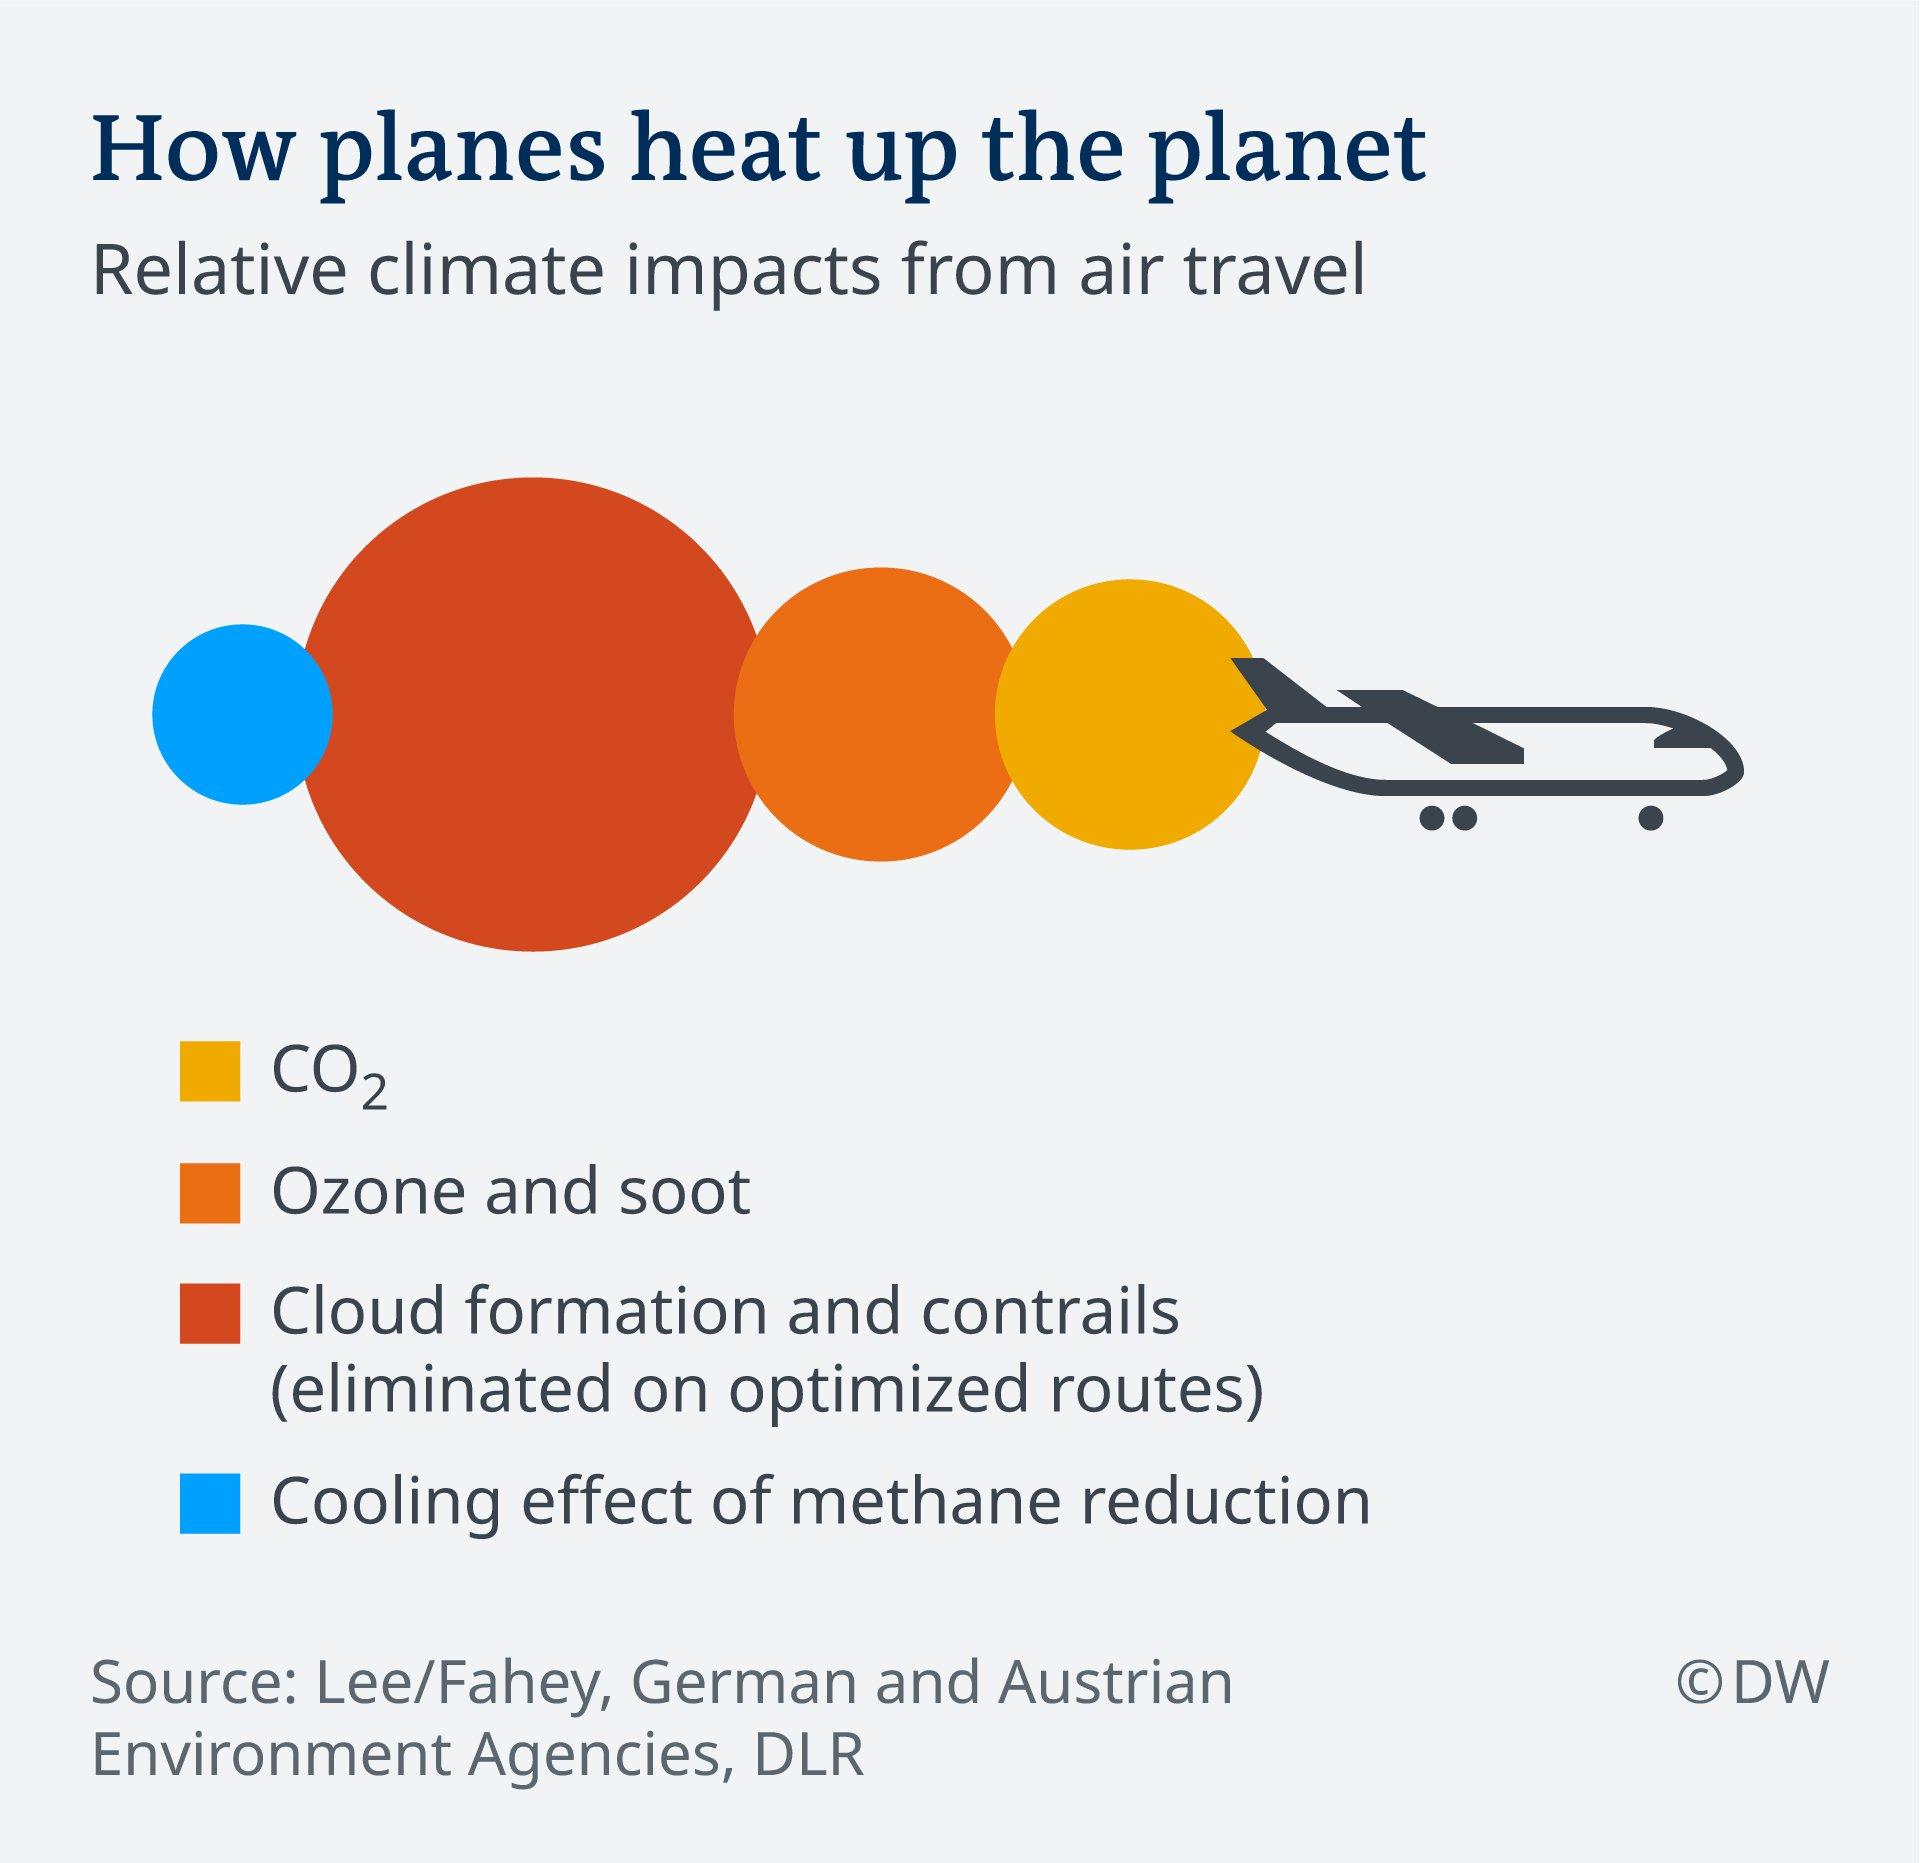 Flightnook - Airplane emissions - Source DW